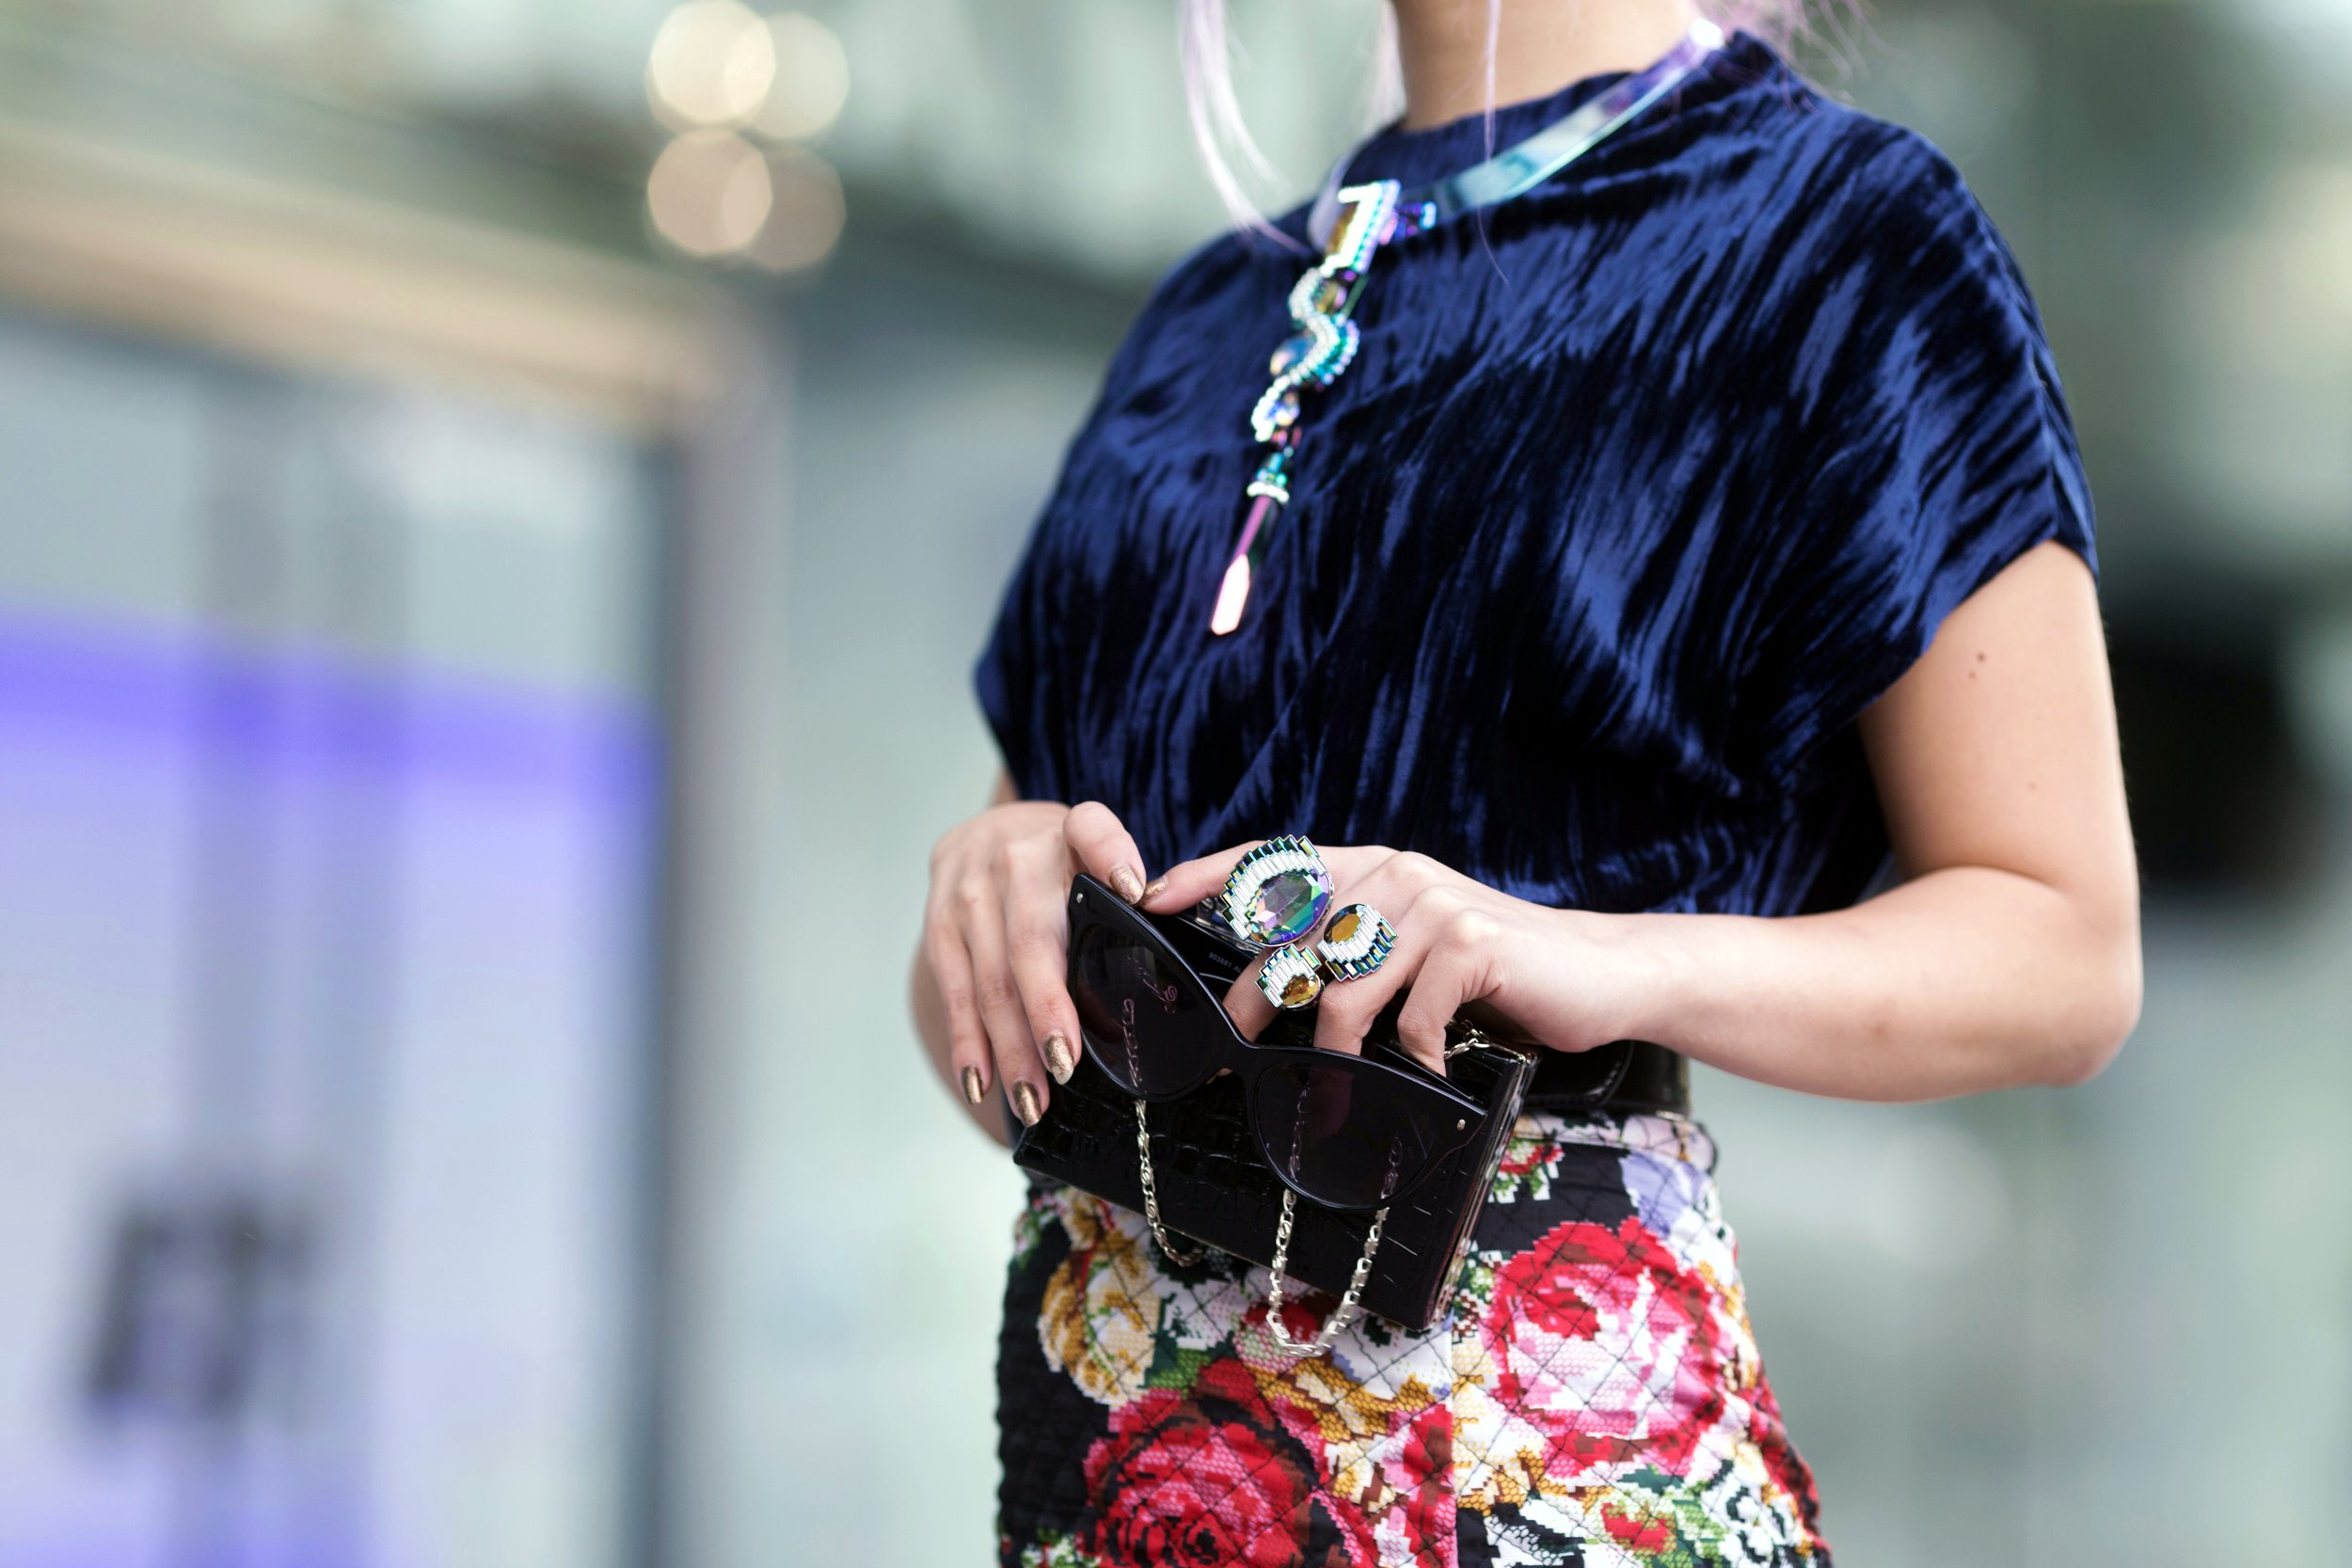 Swarovski Fluorescent Necklace & Fluorescent Ring_Aika's Love Closet_Seattle Fashion Blogger_Japanese_Lavender Hair_Mermaid Hair